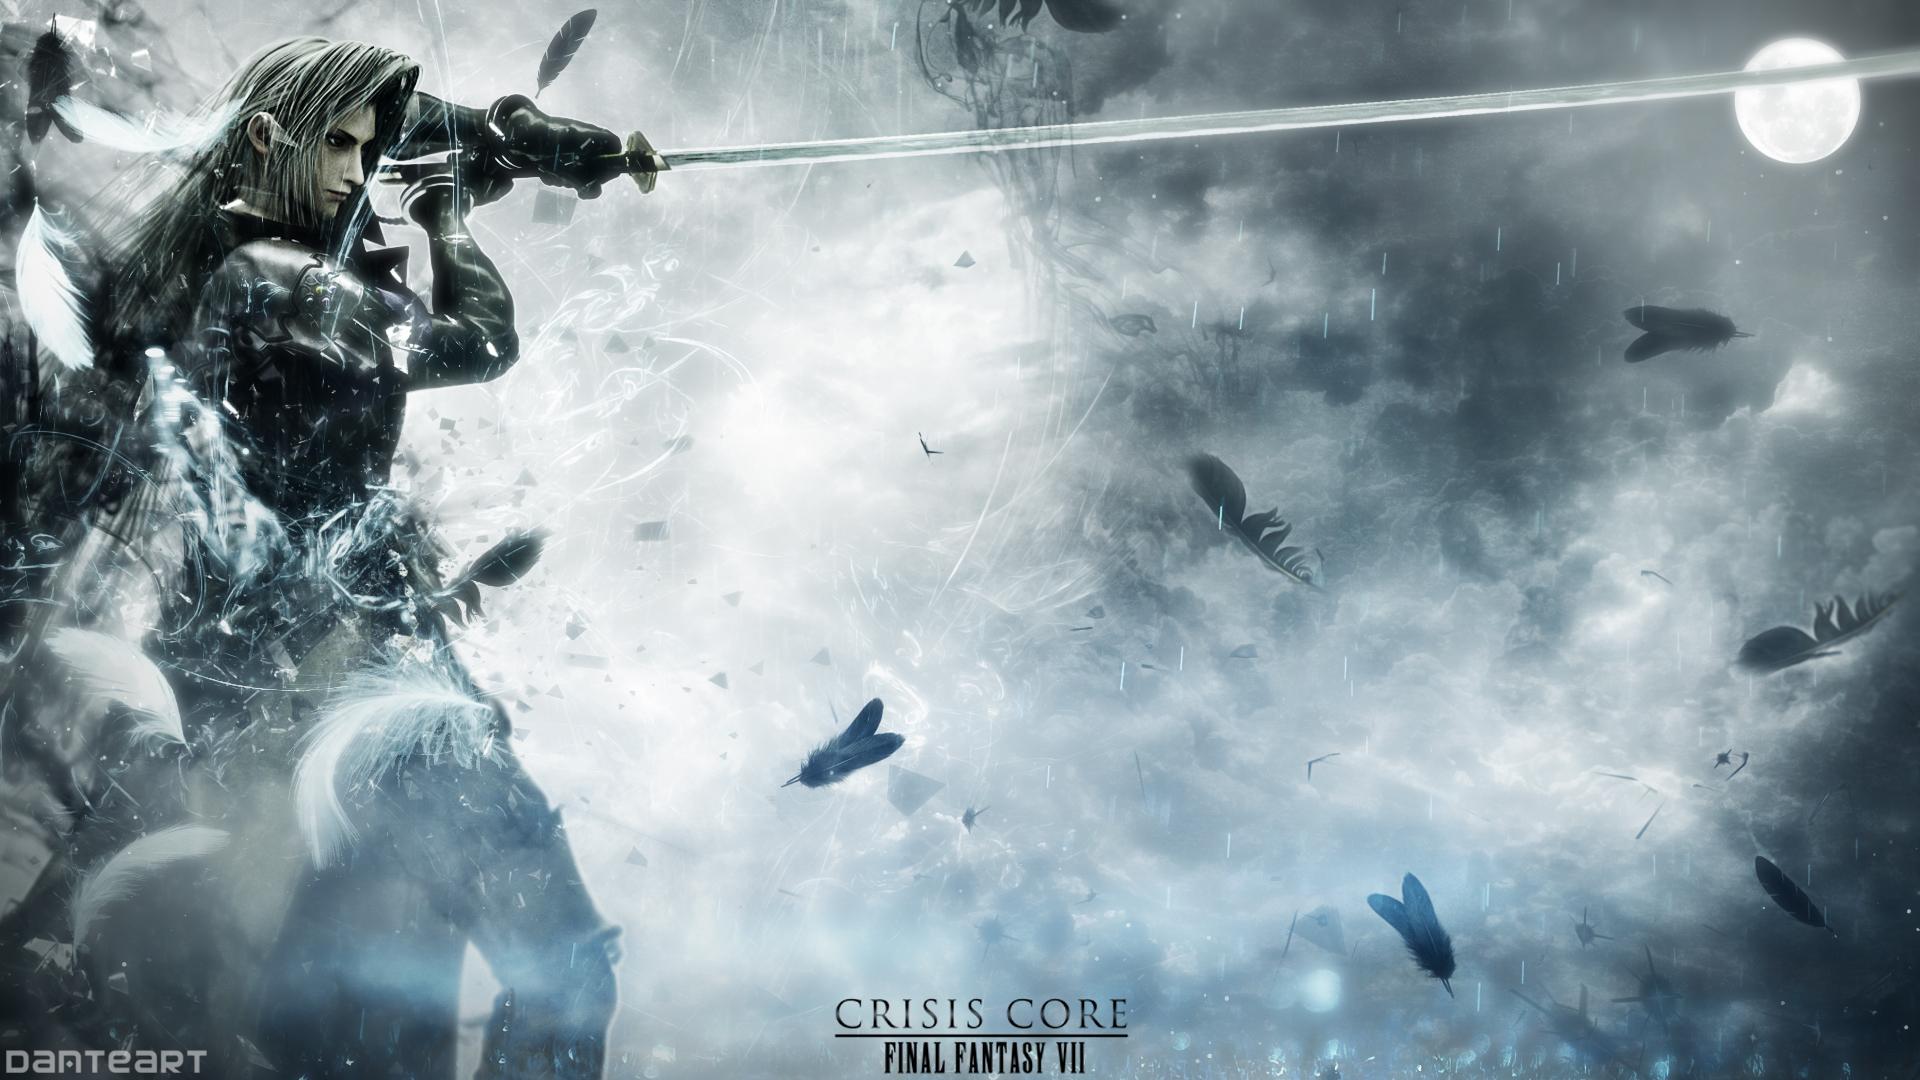 final fantasy 7 crisis core wallpaper hd